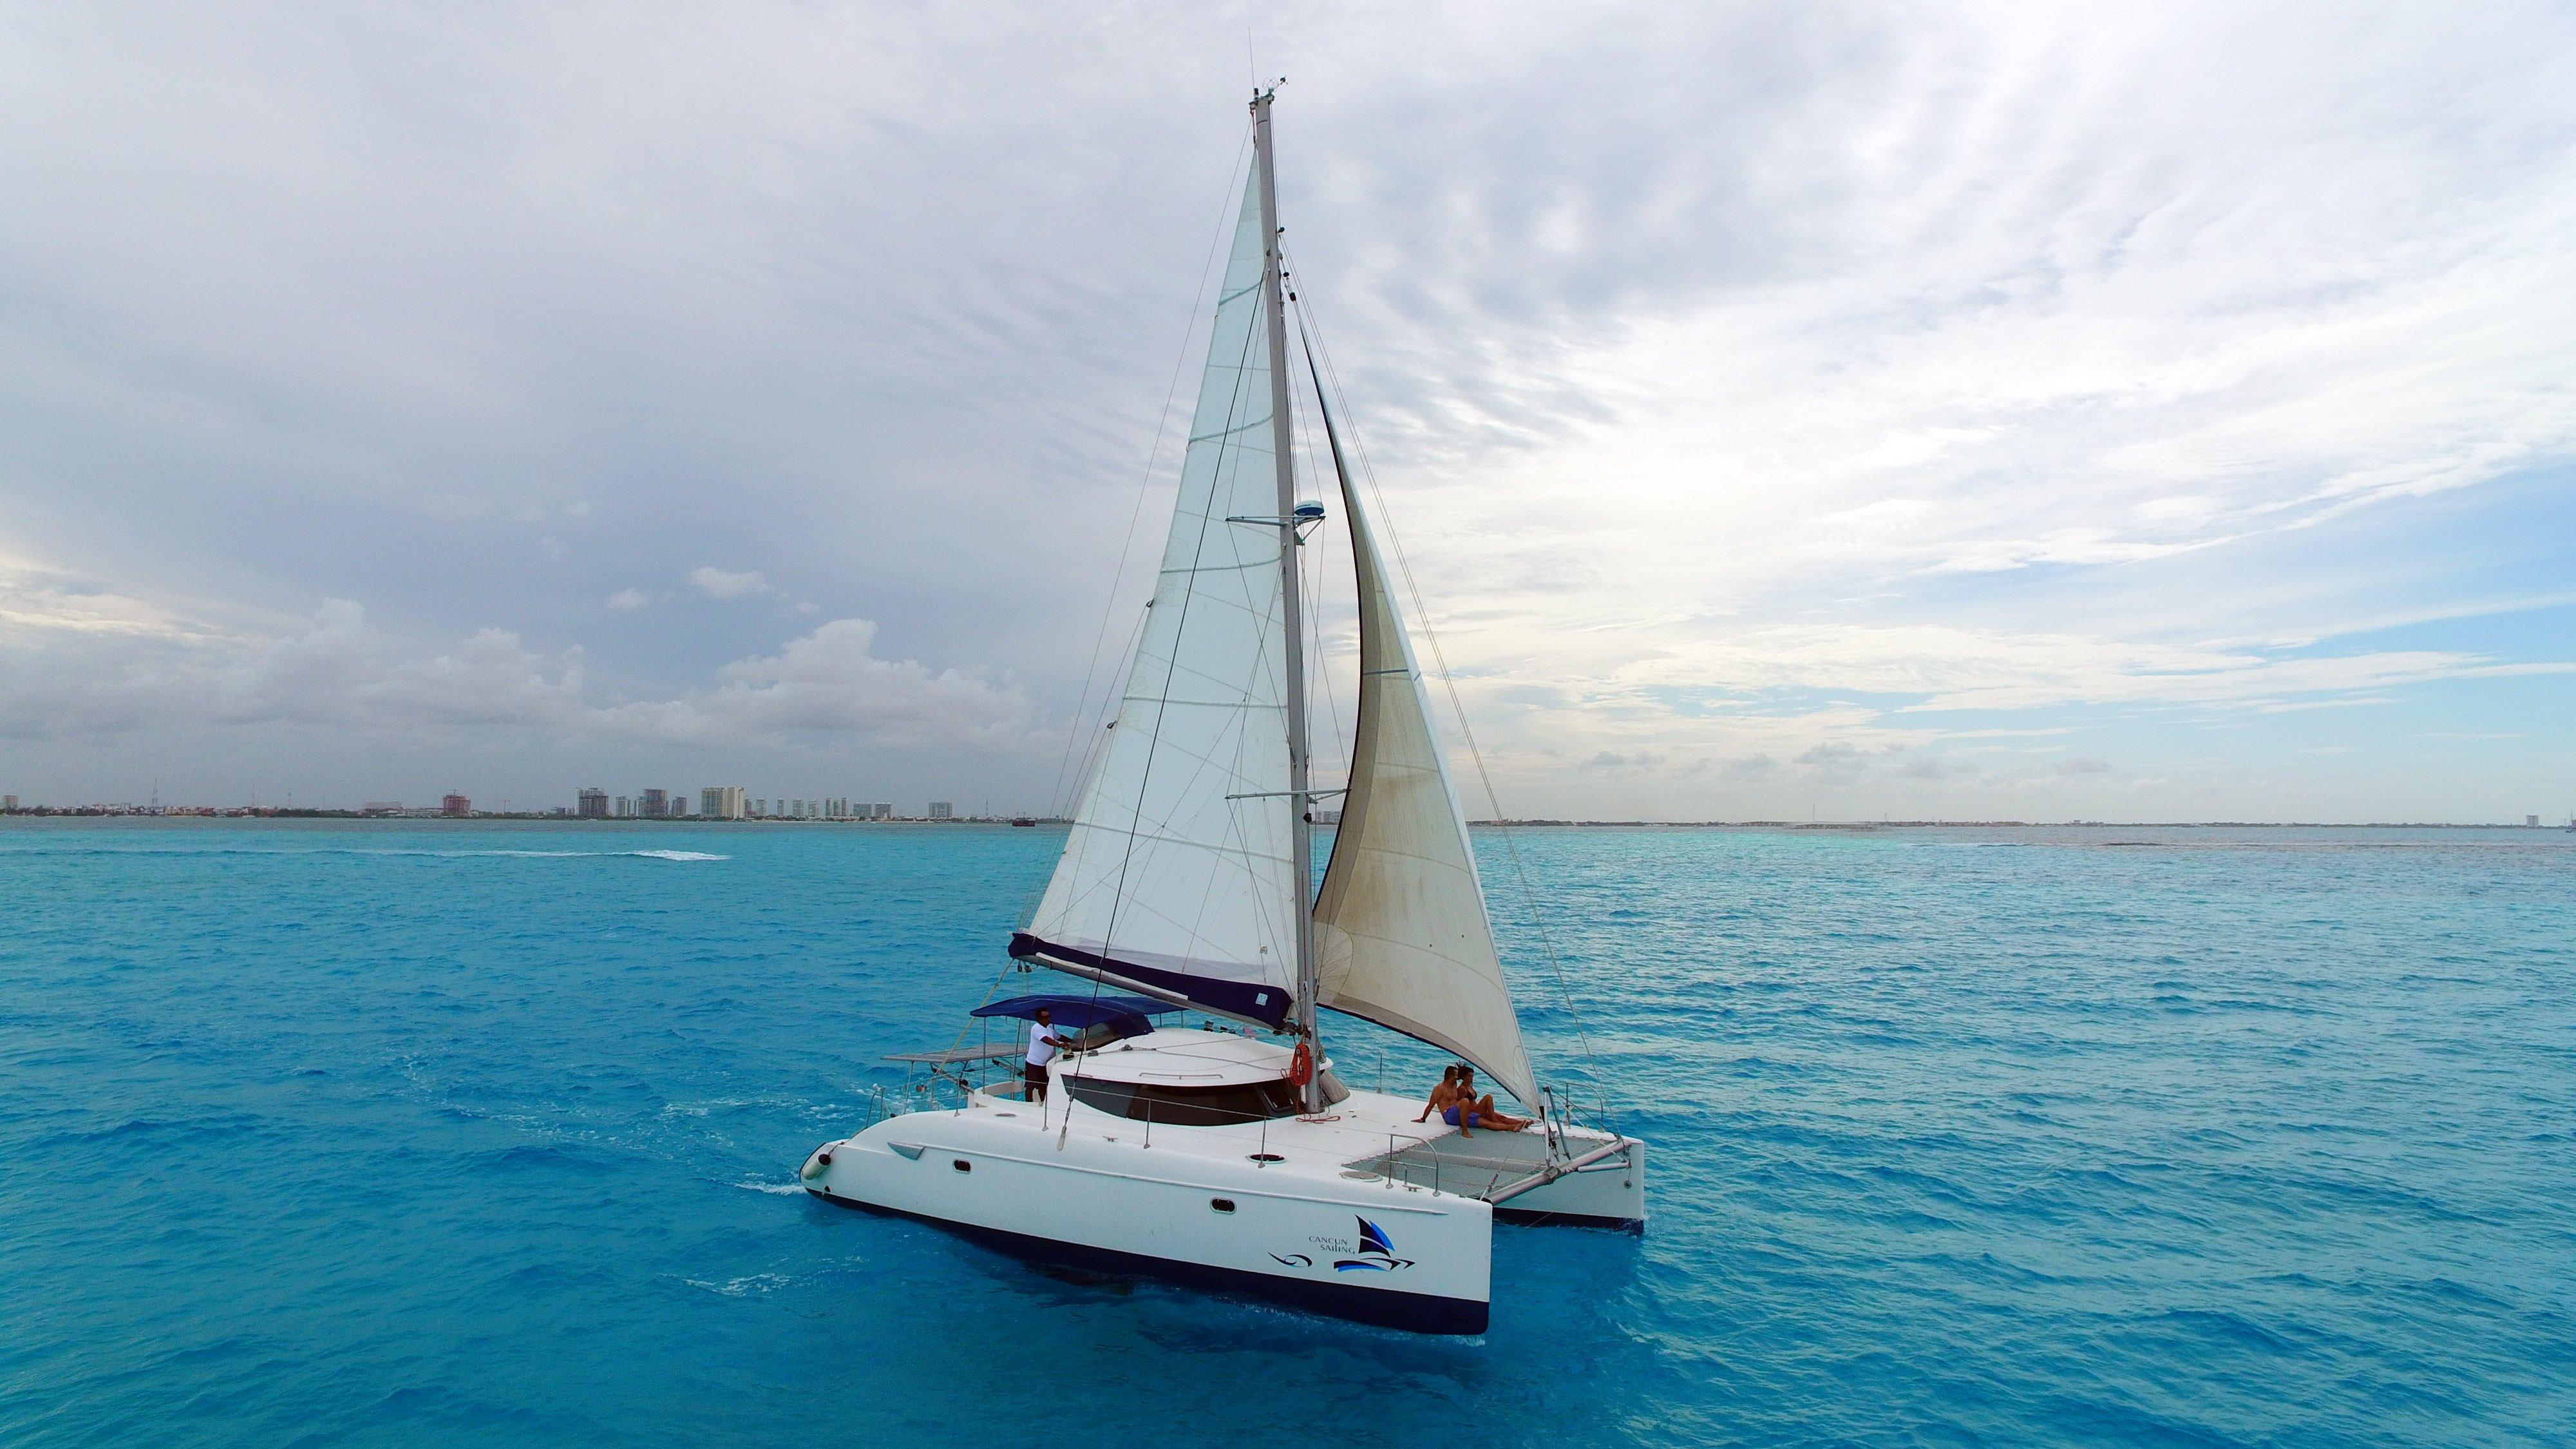 Malube Catamarán